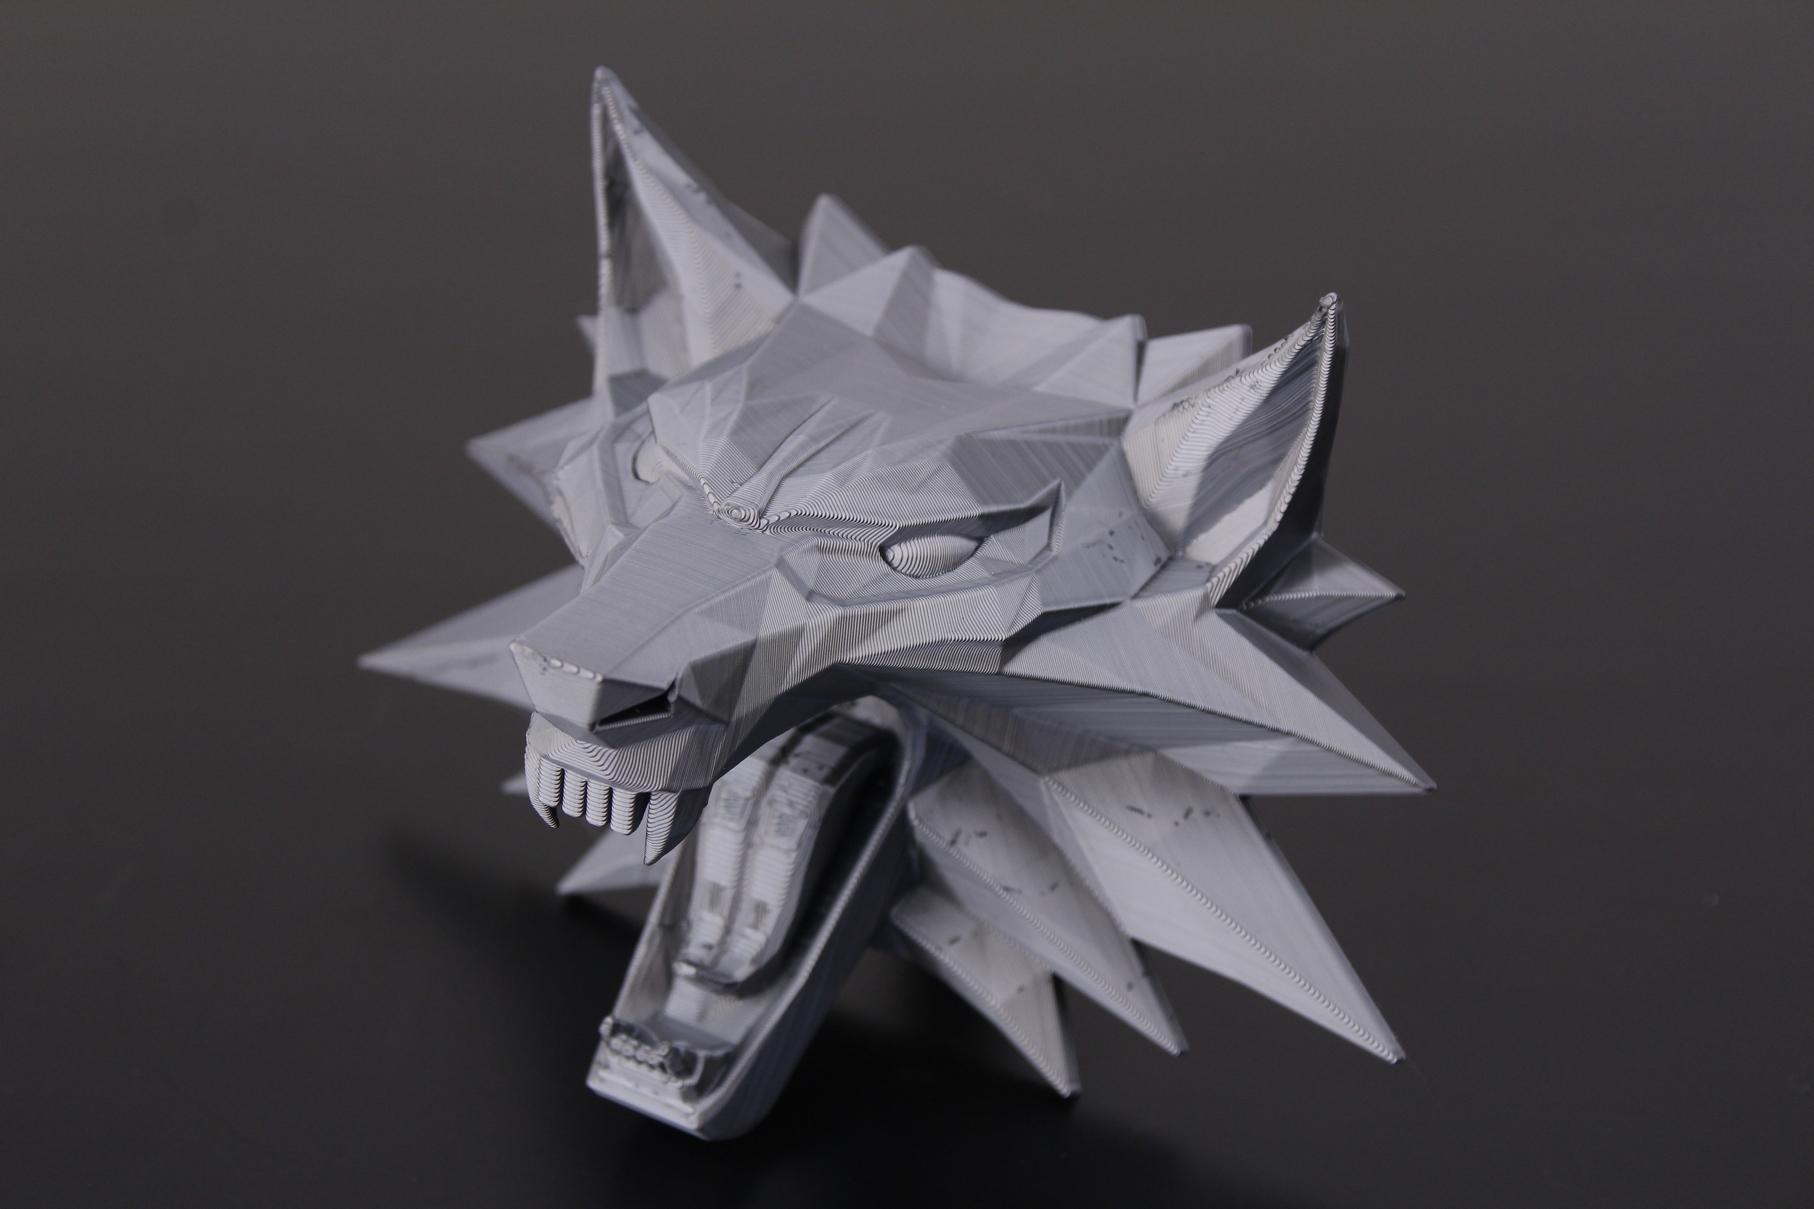 Witcher Wolf Medallion 4 | Trianglelab Spiral Tower Hotend Review